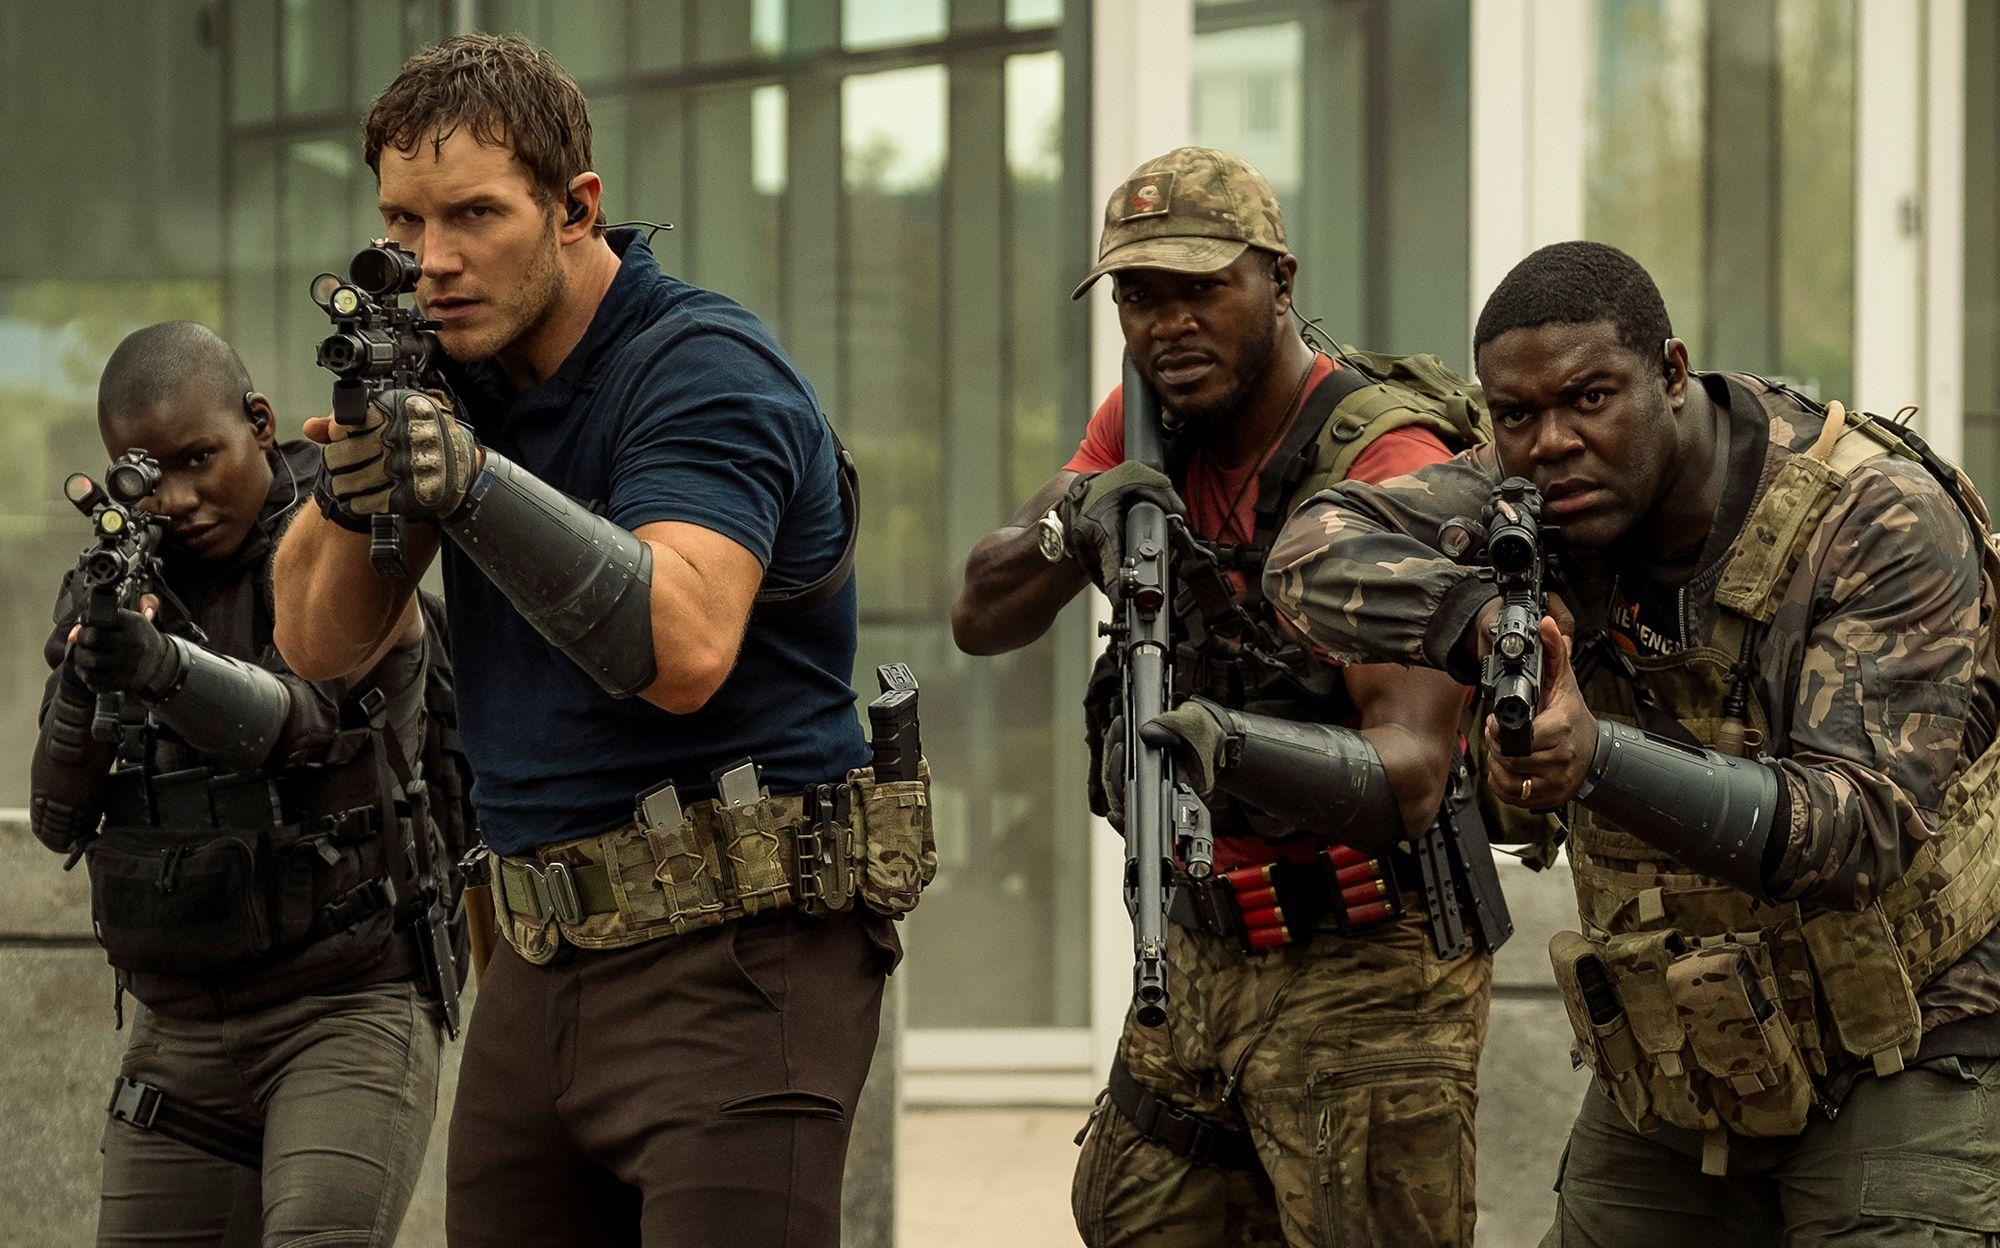 The Tomorrow War Trailer Reveals Chris Pratt's Sci-Fi Epic